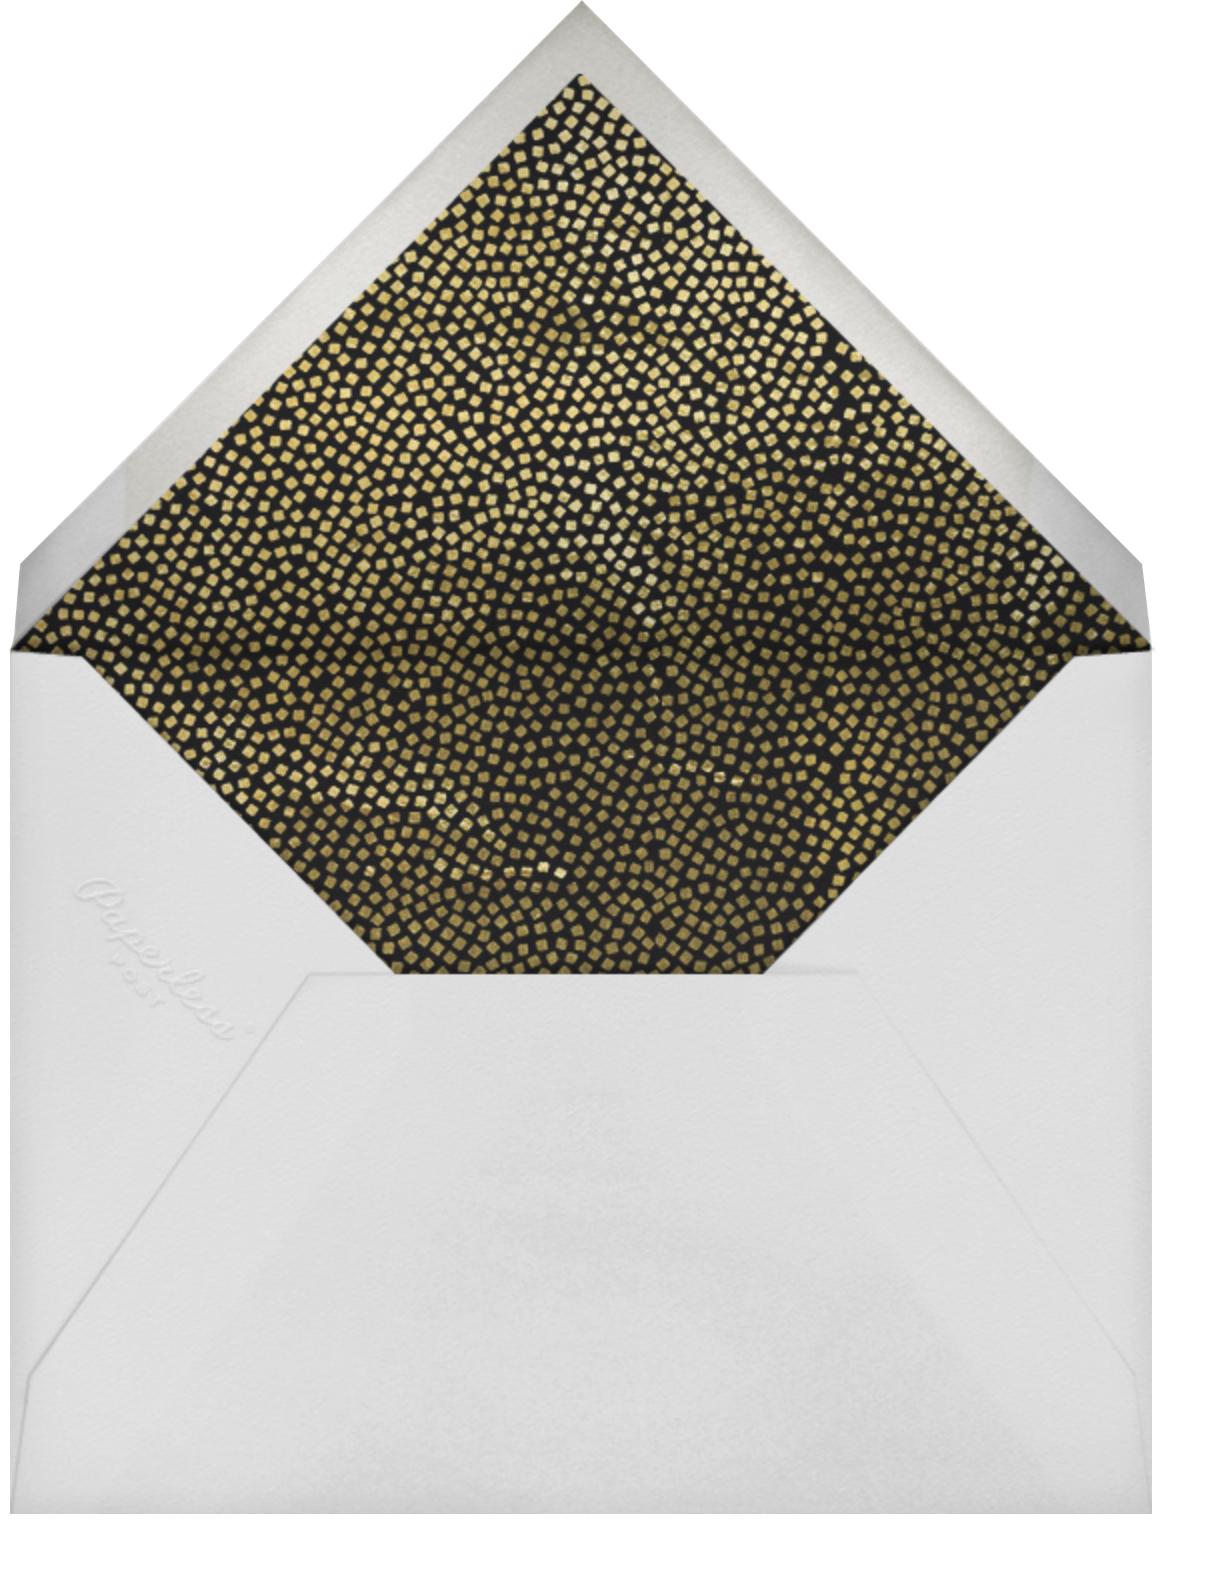 Konfetti (Photo Save the Date) - Gold - Kelly Wearstler - Photo  - envelope back